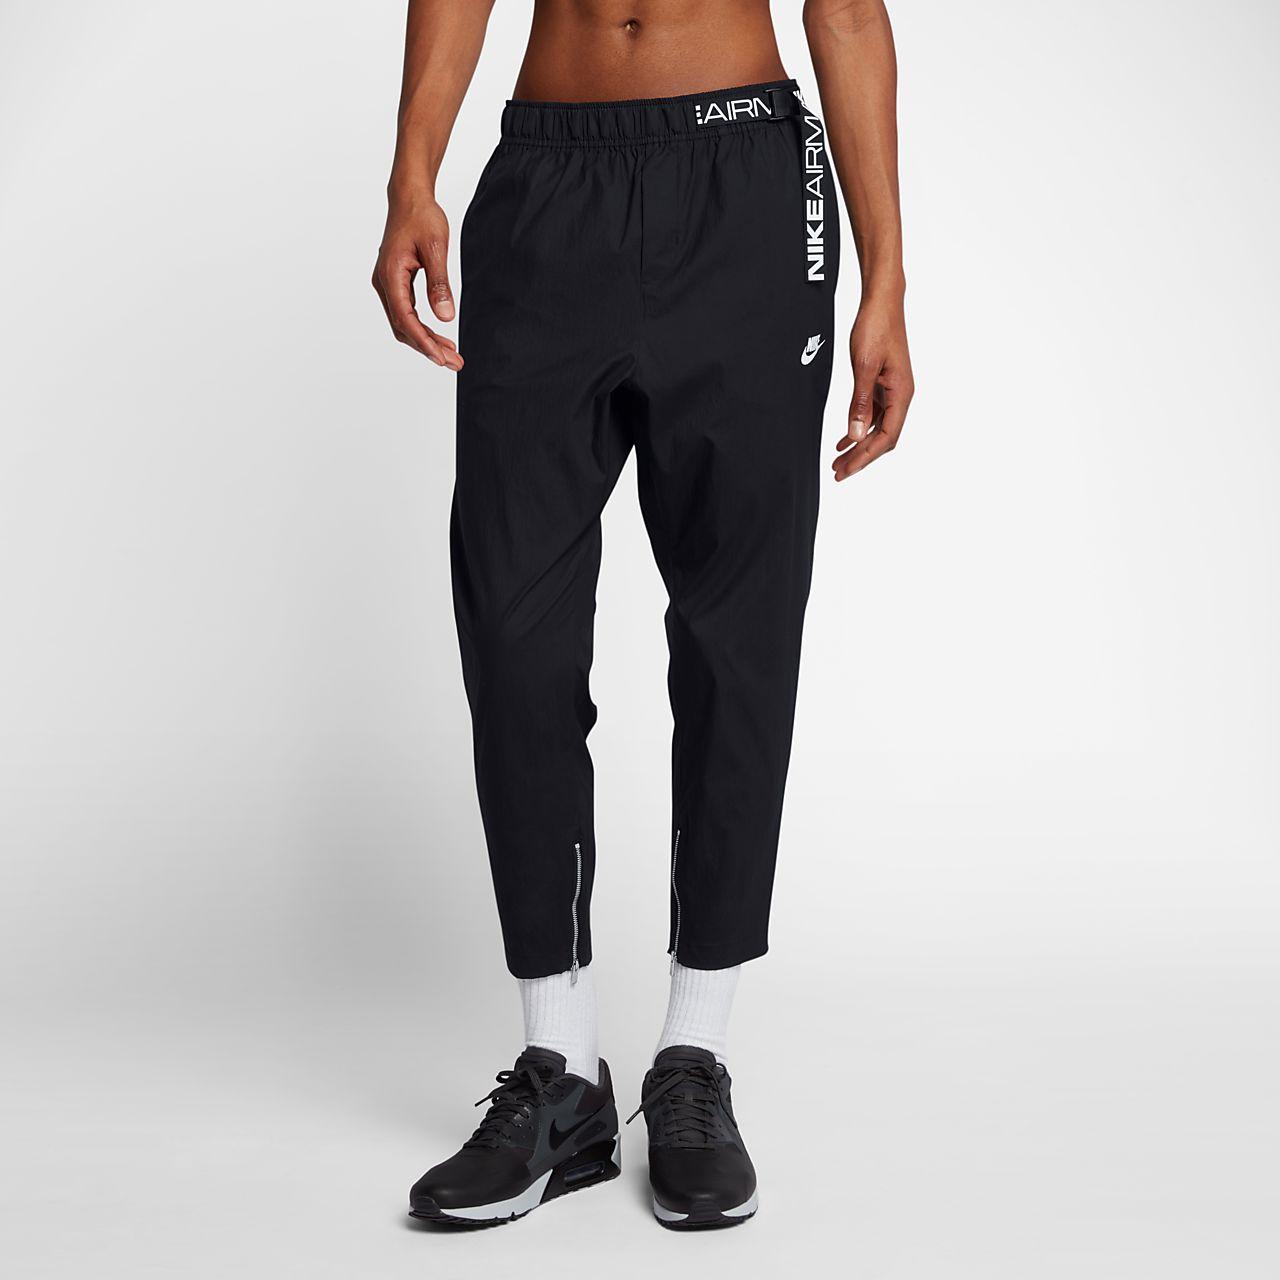 le dernier 1e6f3 f749e Pantalon tissé Nike Sportswear Air Max pour Homme